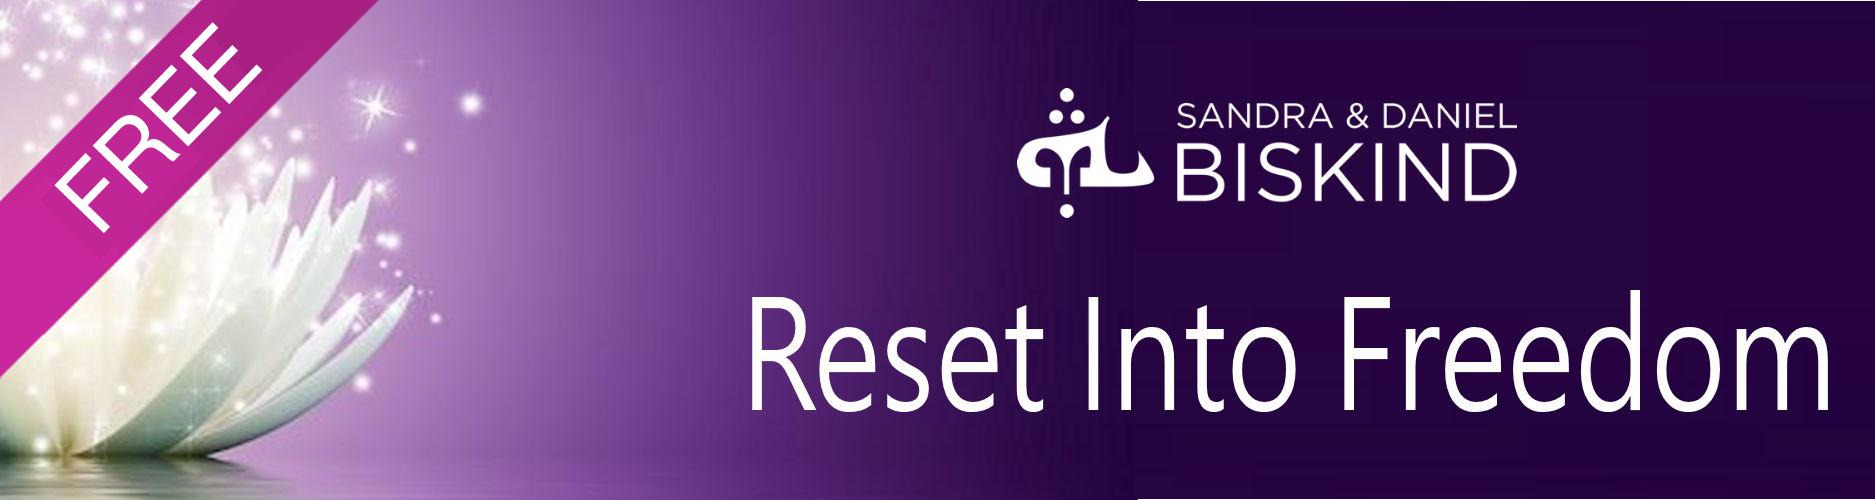 Home reset into freedom best seller banner for website2 1